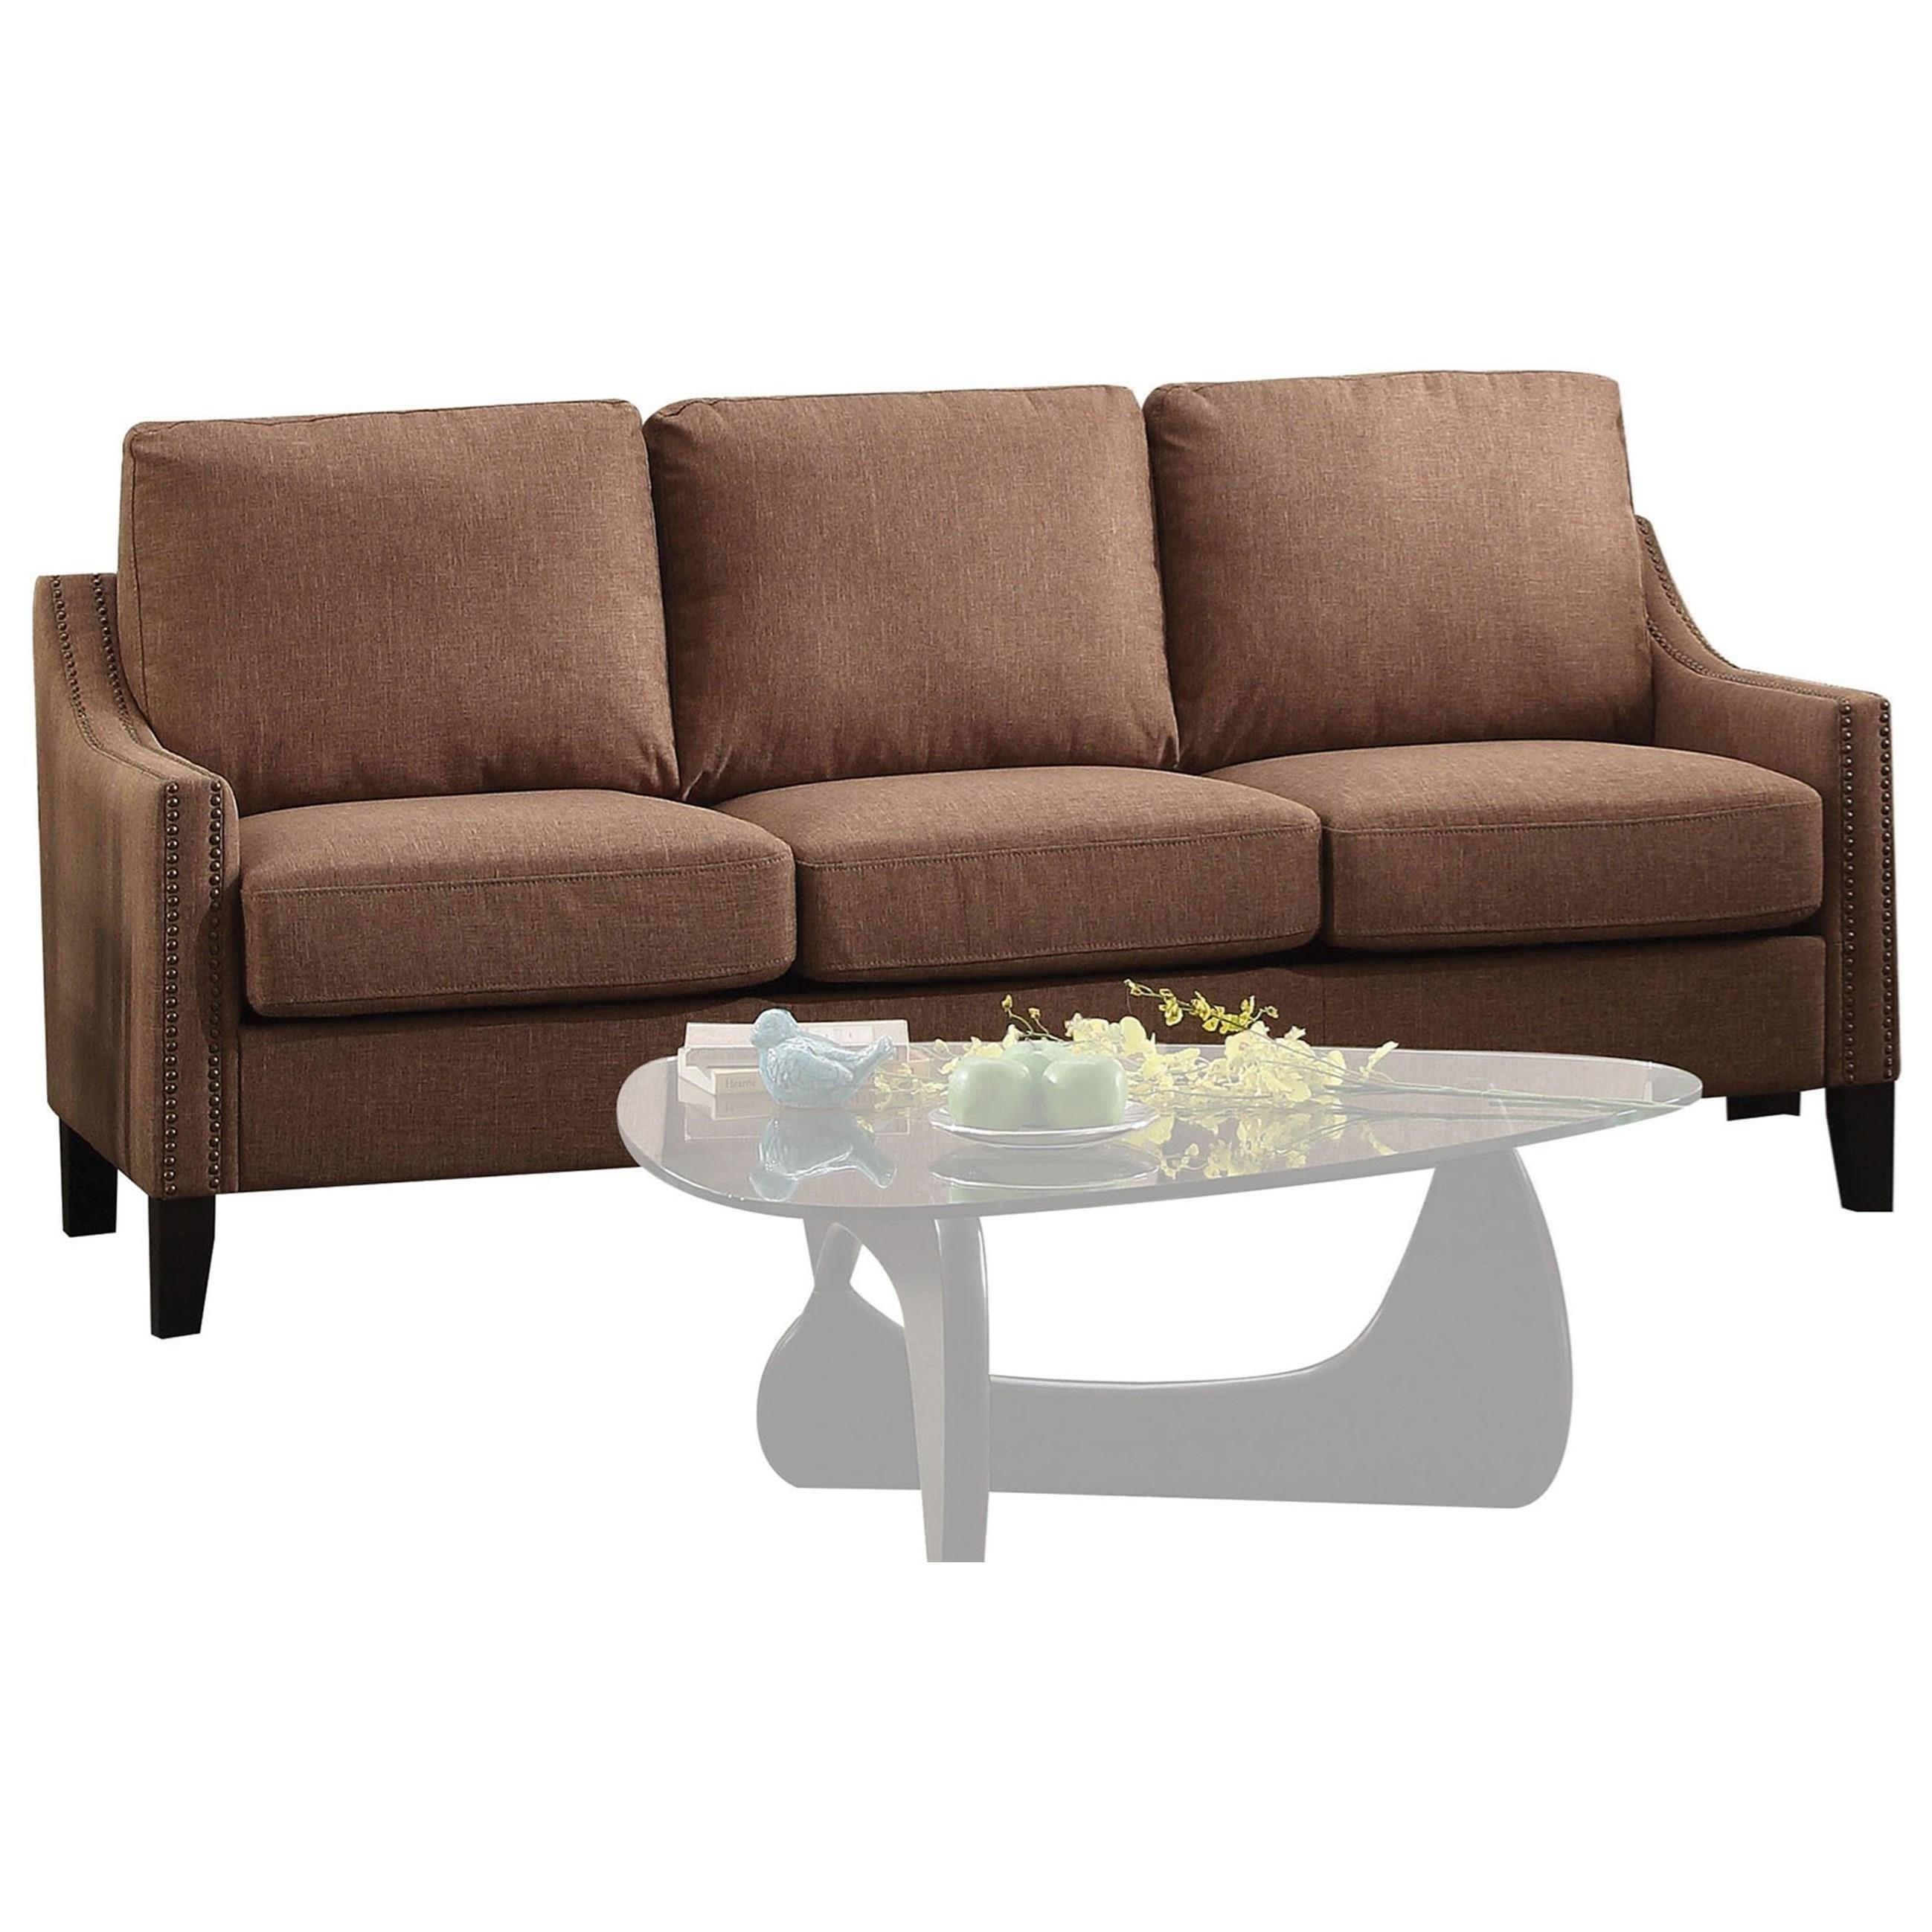 Zapata (Jr) Sofa by Acme Furniture at Corner Furniture